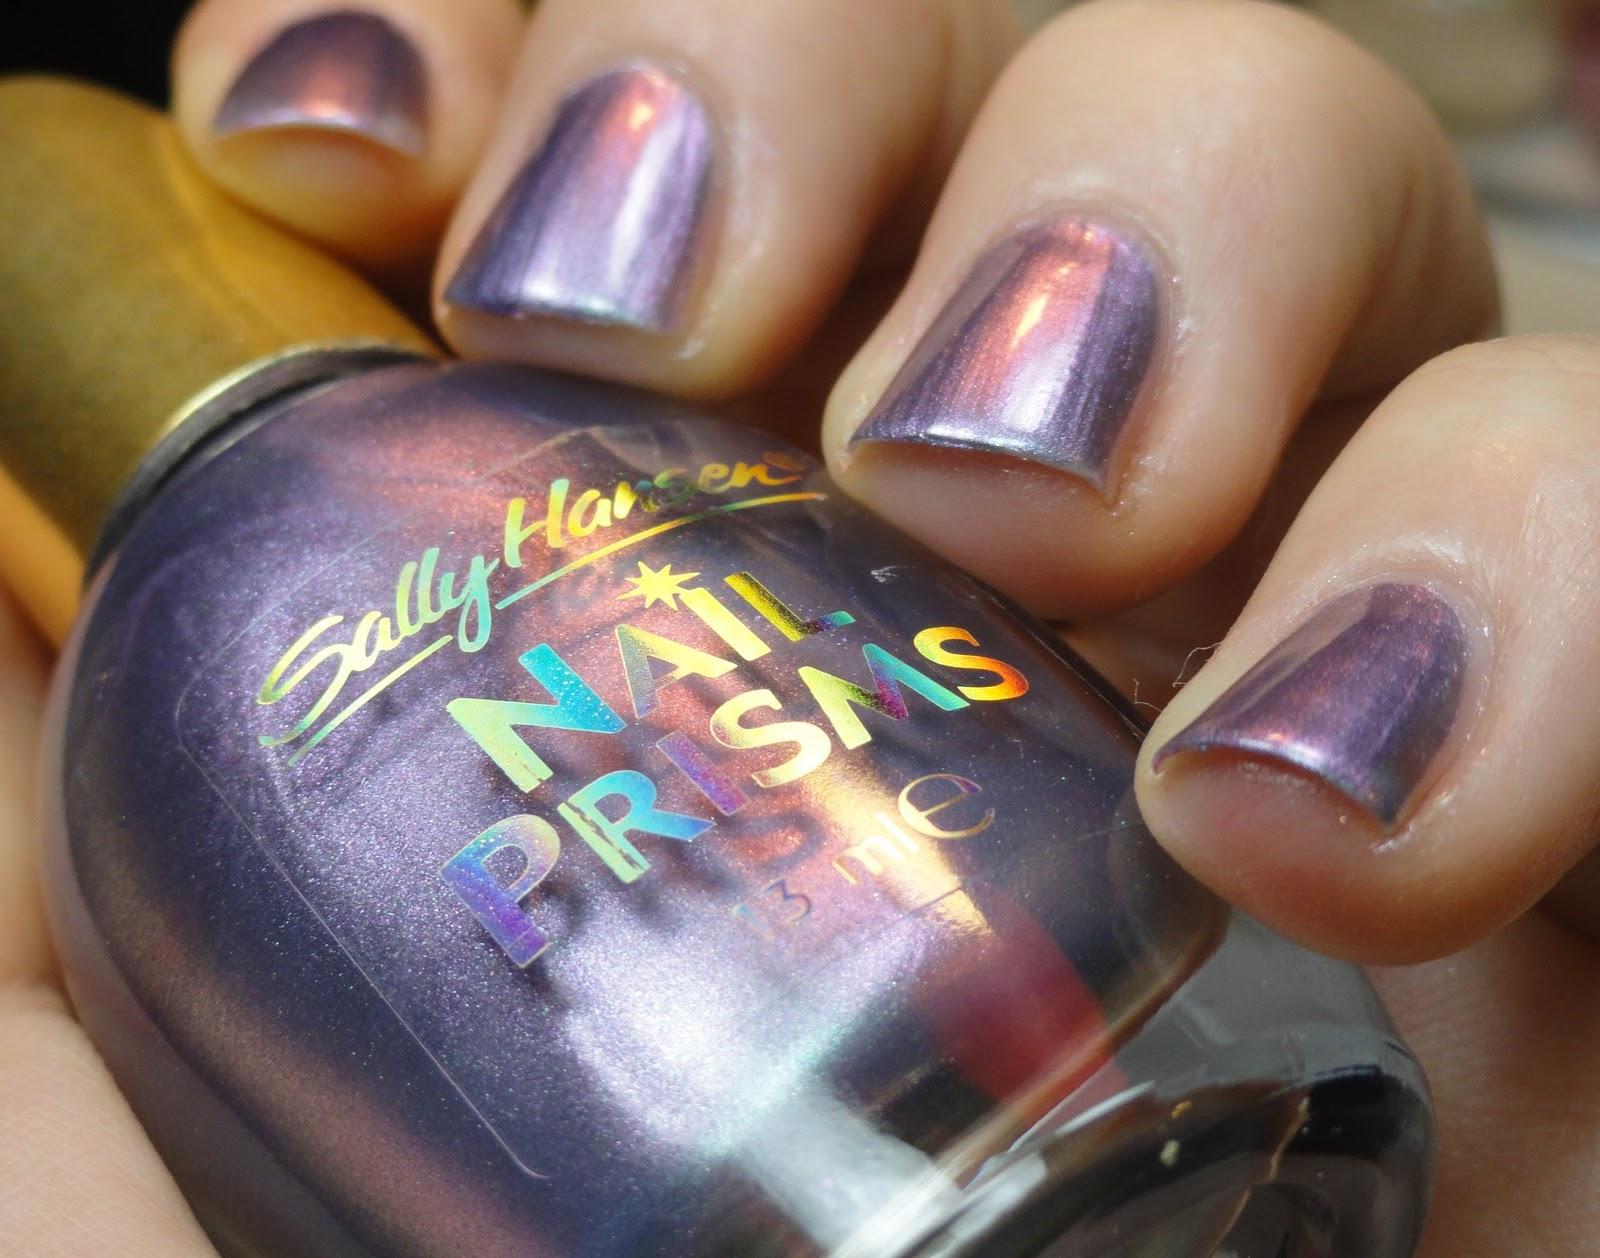 Elemental Styles Sally Hansen Nail Prisms